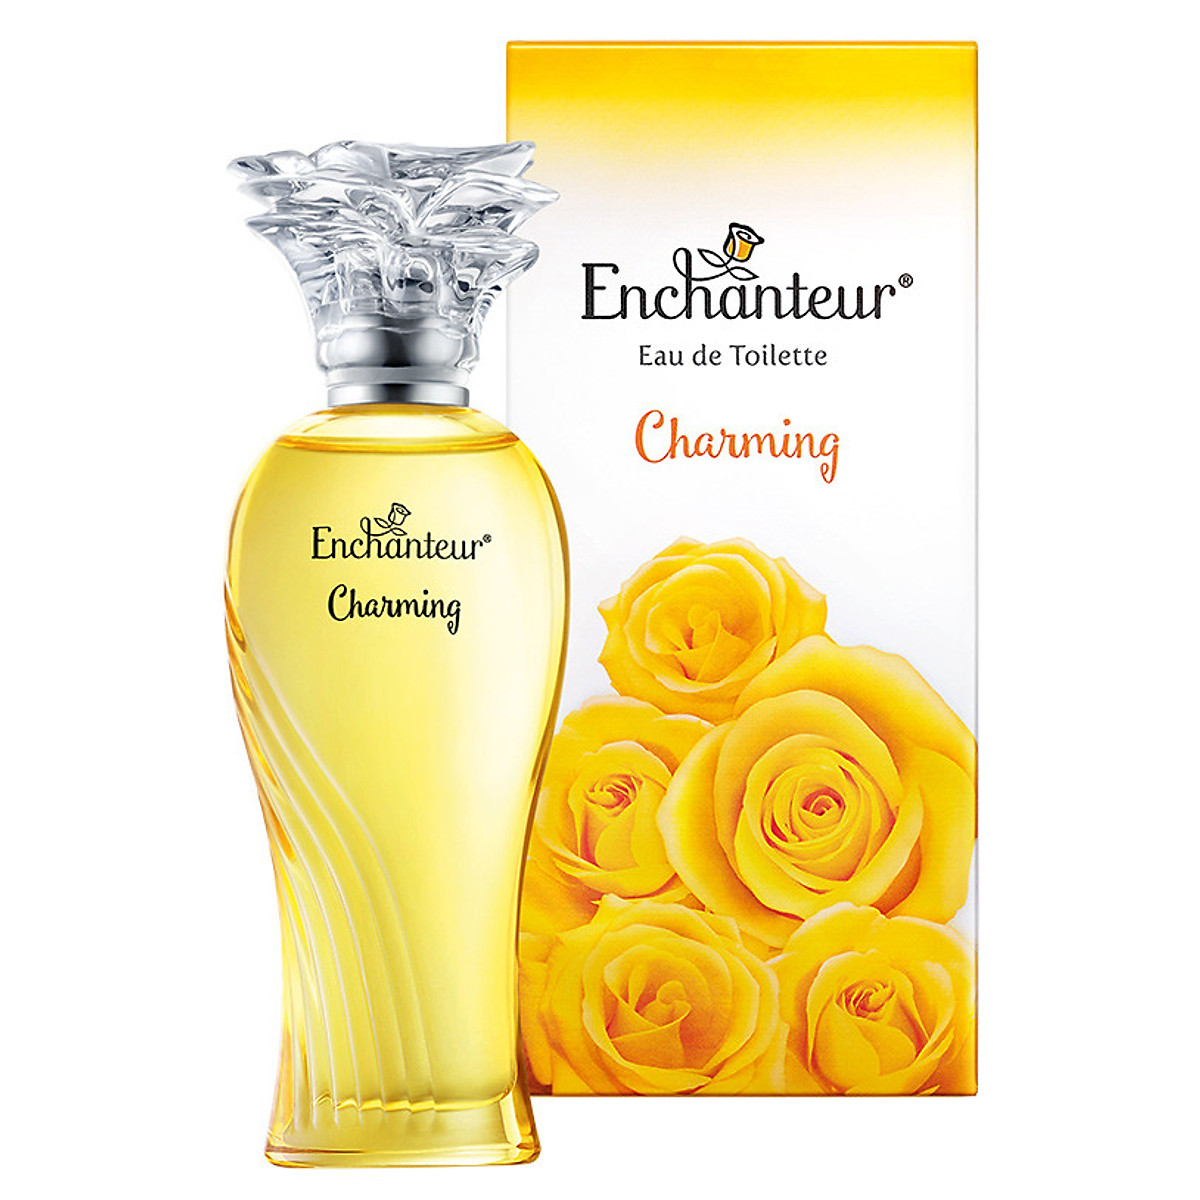 Nước Hoa Cao Cấp Enchanteur Charming (50ml)+Tặng Nước Bỏ túi Enchanteur 18ml